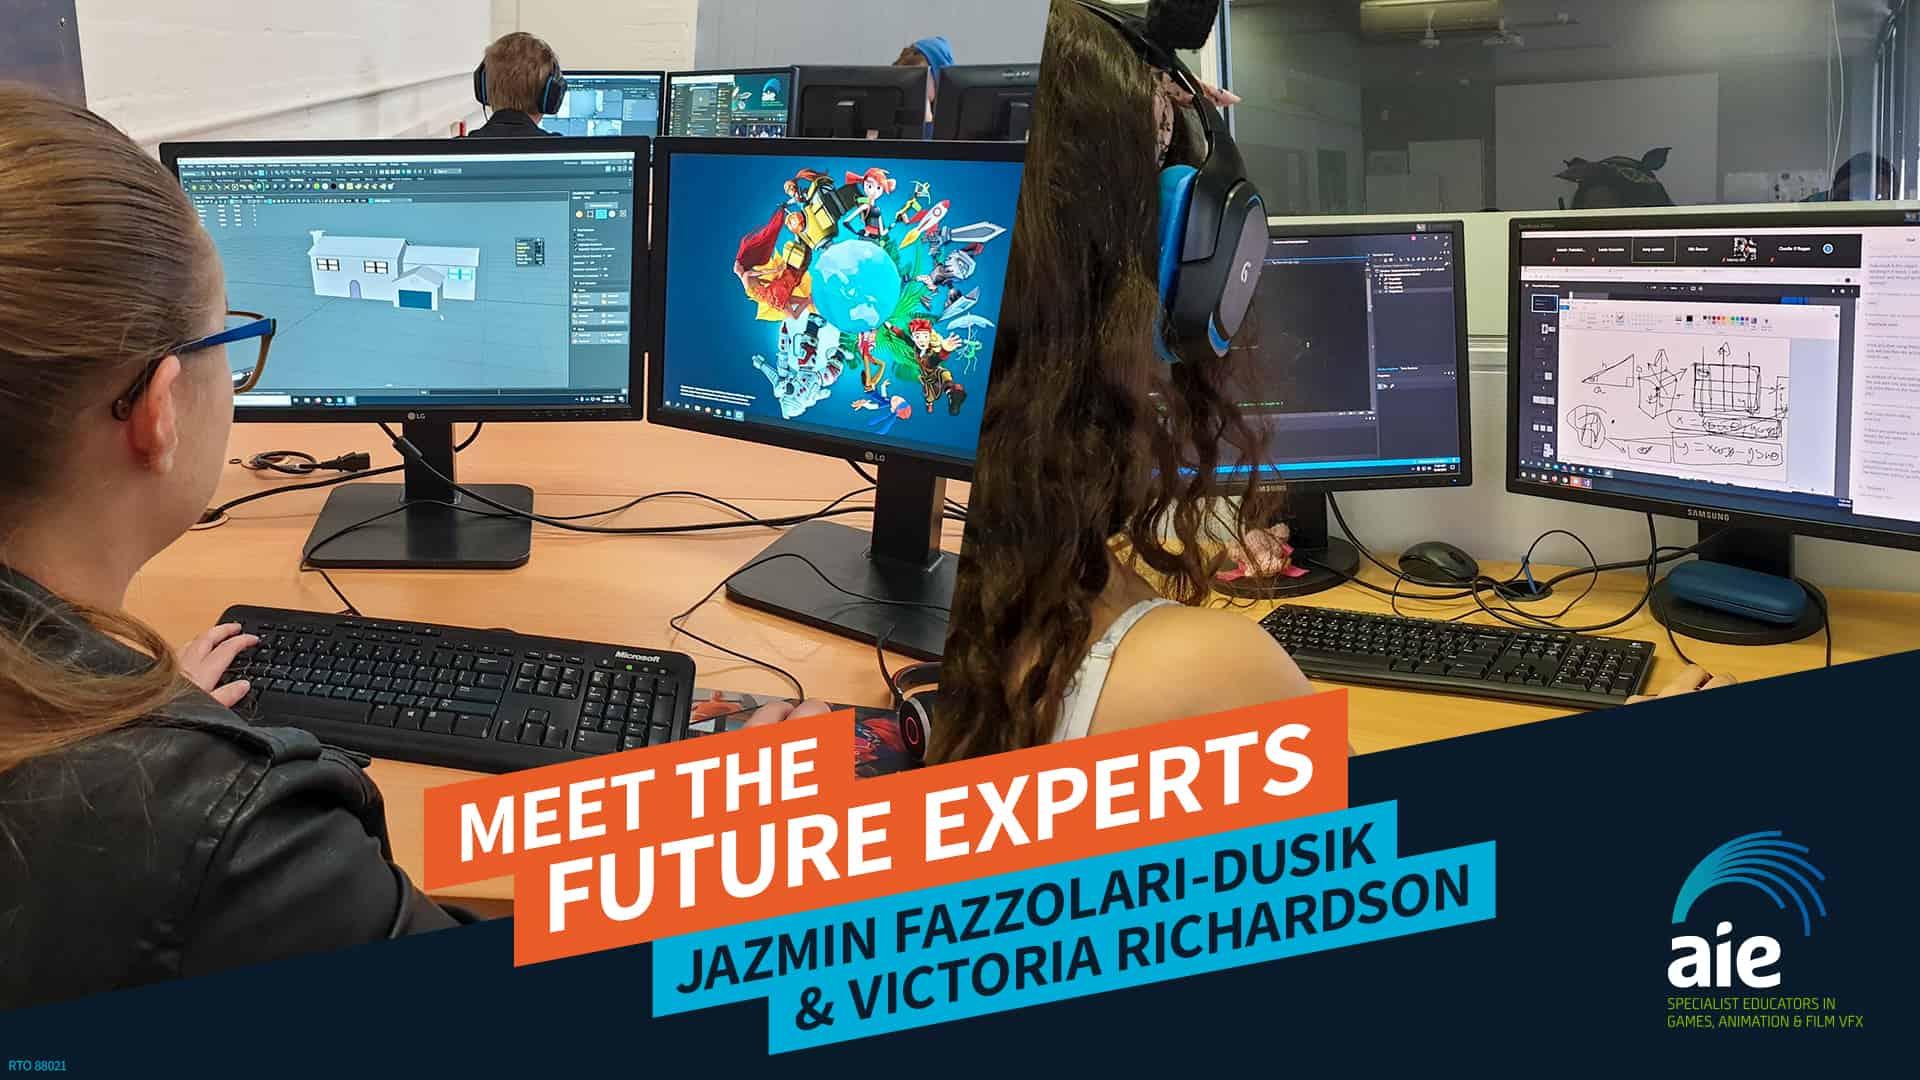 Meet to the Future Experts: Jazmin Fazzolari-Dusik & Victoria Richardson | AIE Workshop